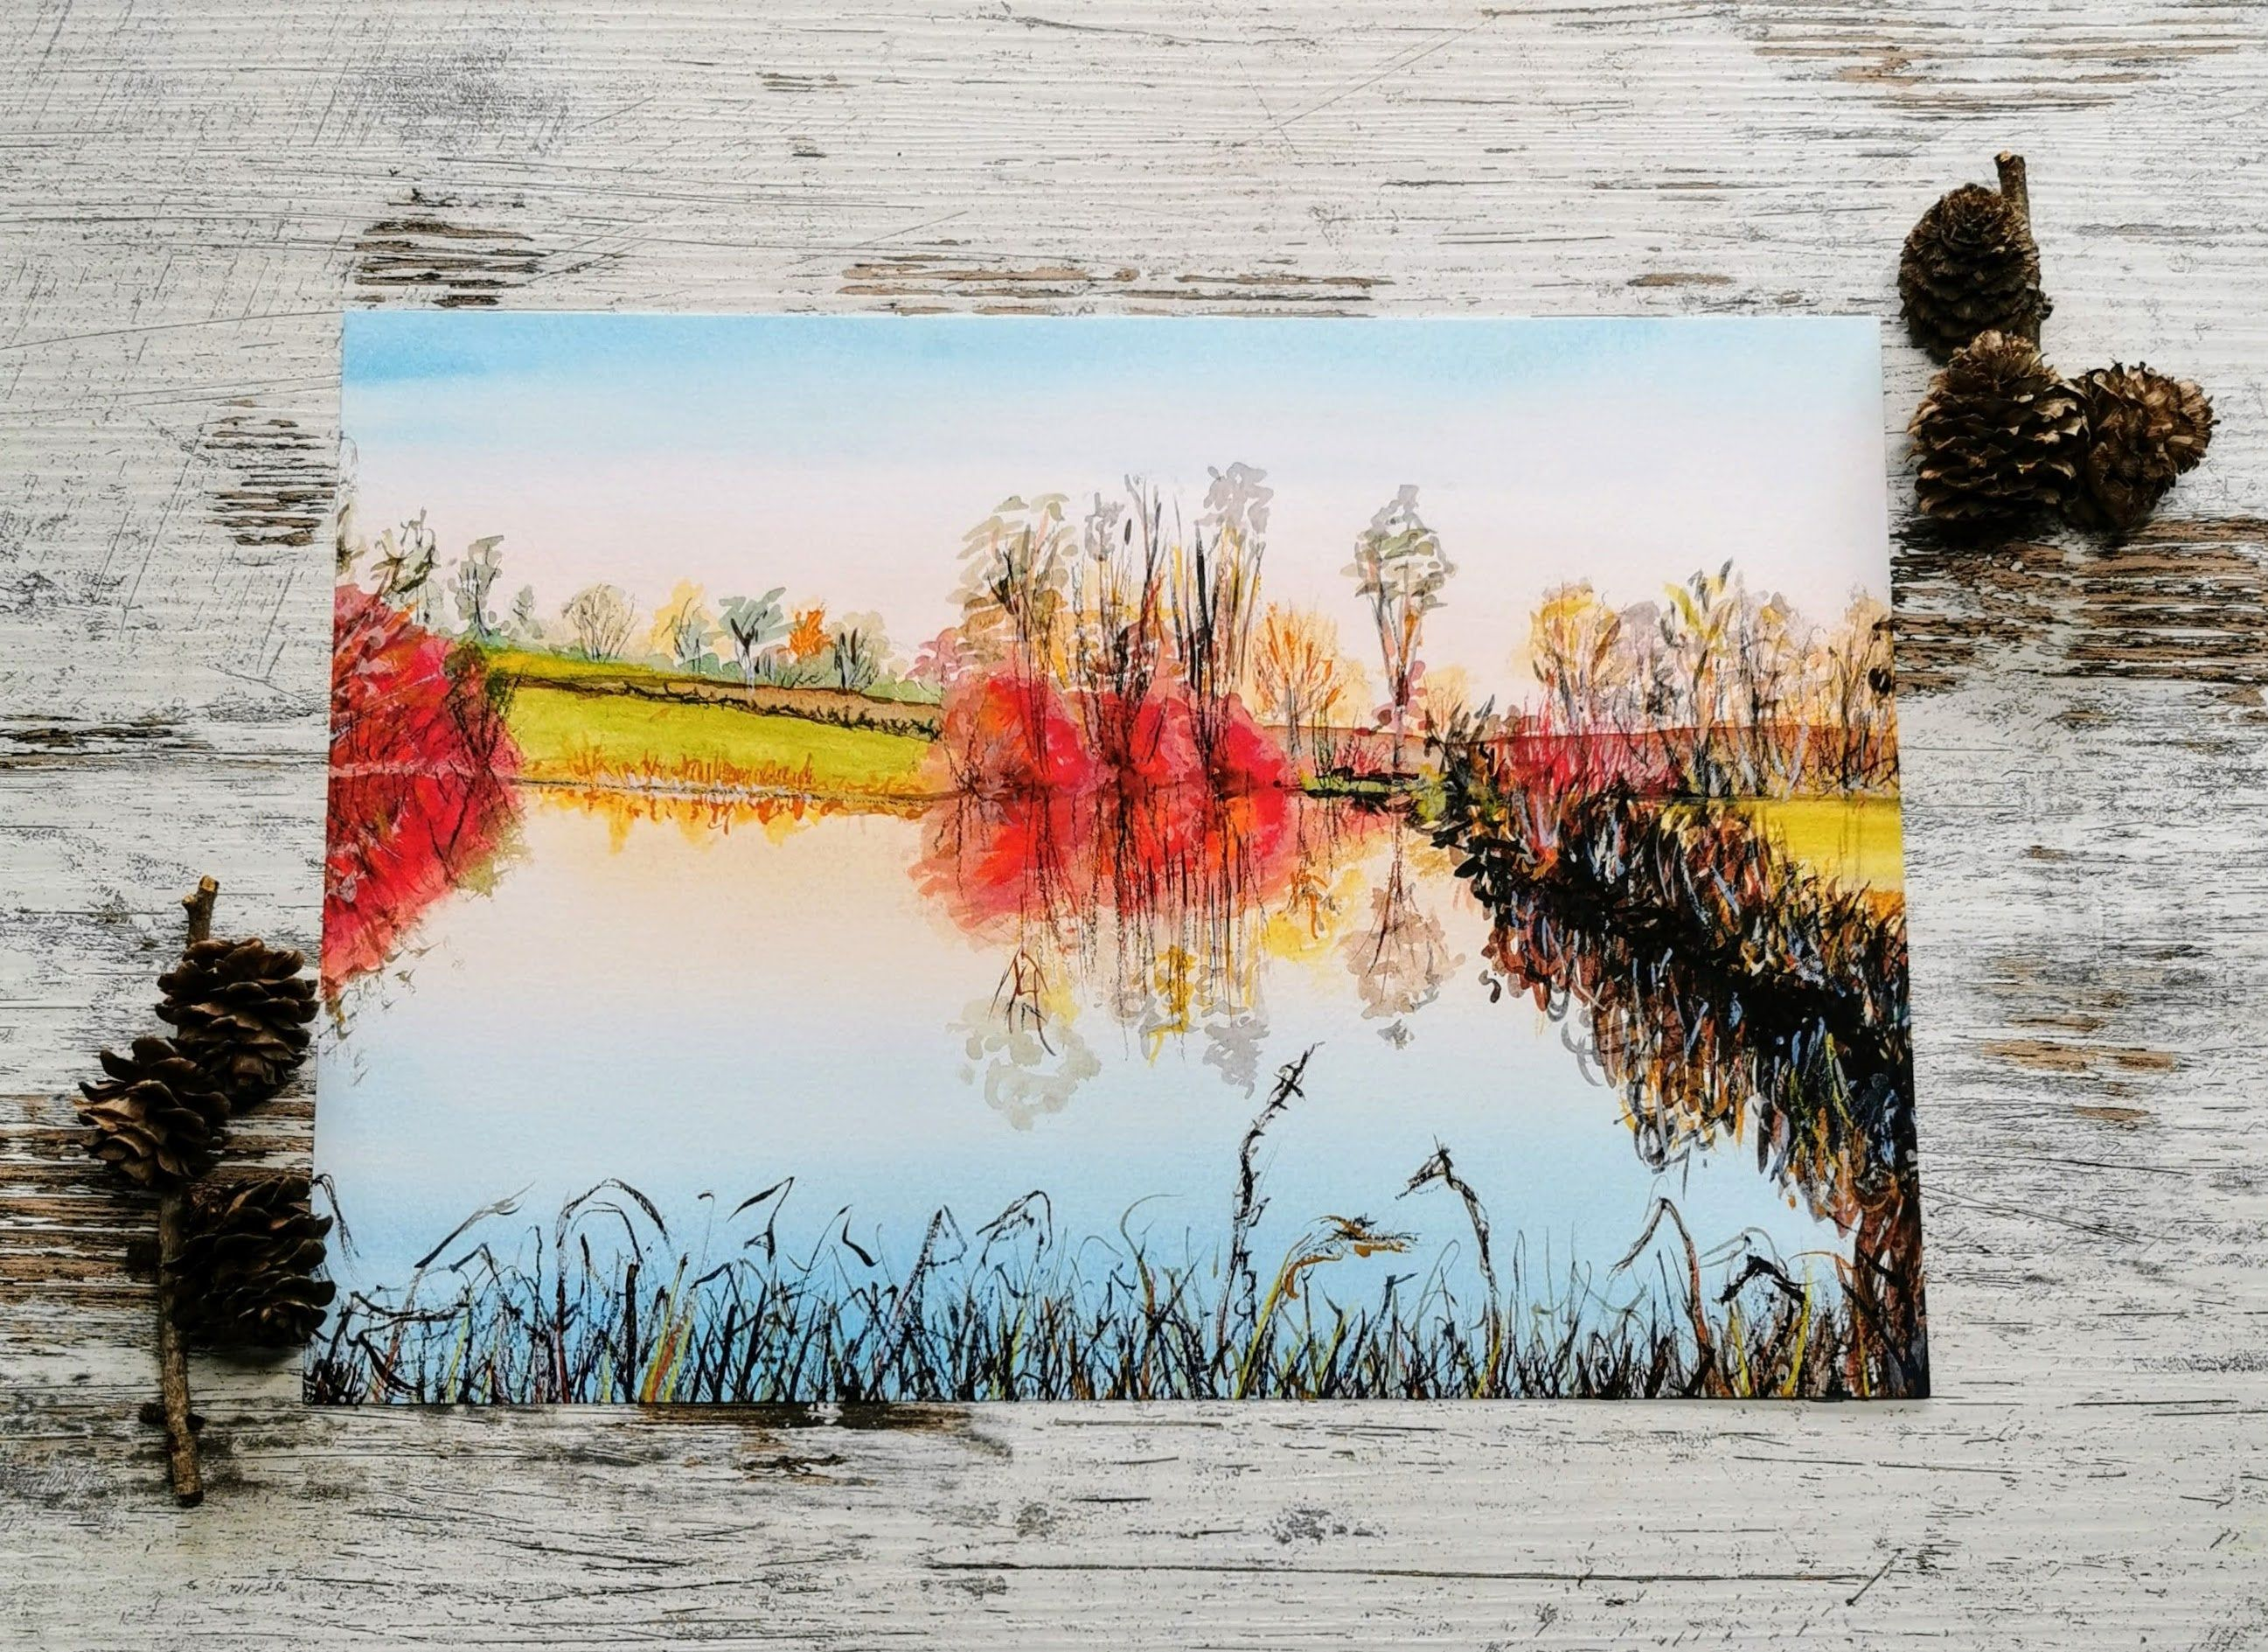 English Countryside Landscape A4 Watercolor Fine Art Print Lakeside View Autumn Scene British Countryside Countryside Landscape Autumn Scenes Fine Art